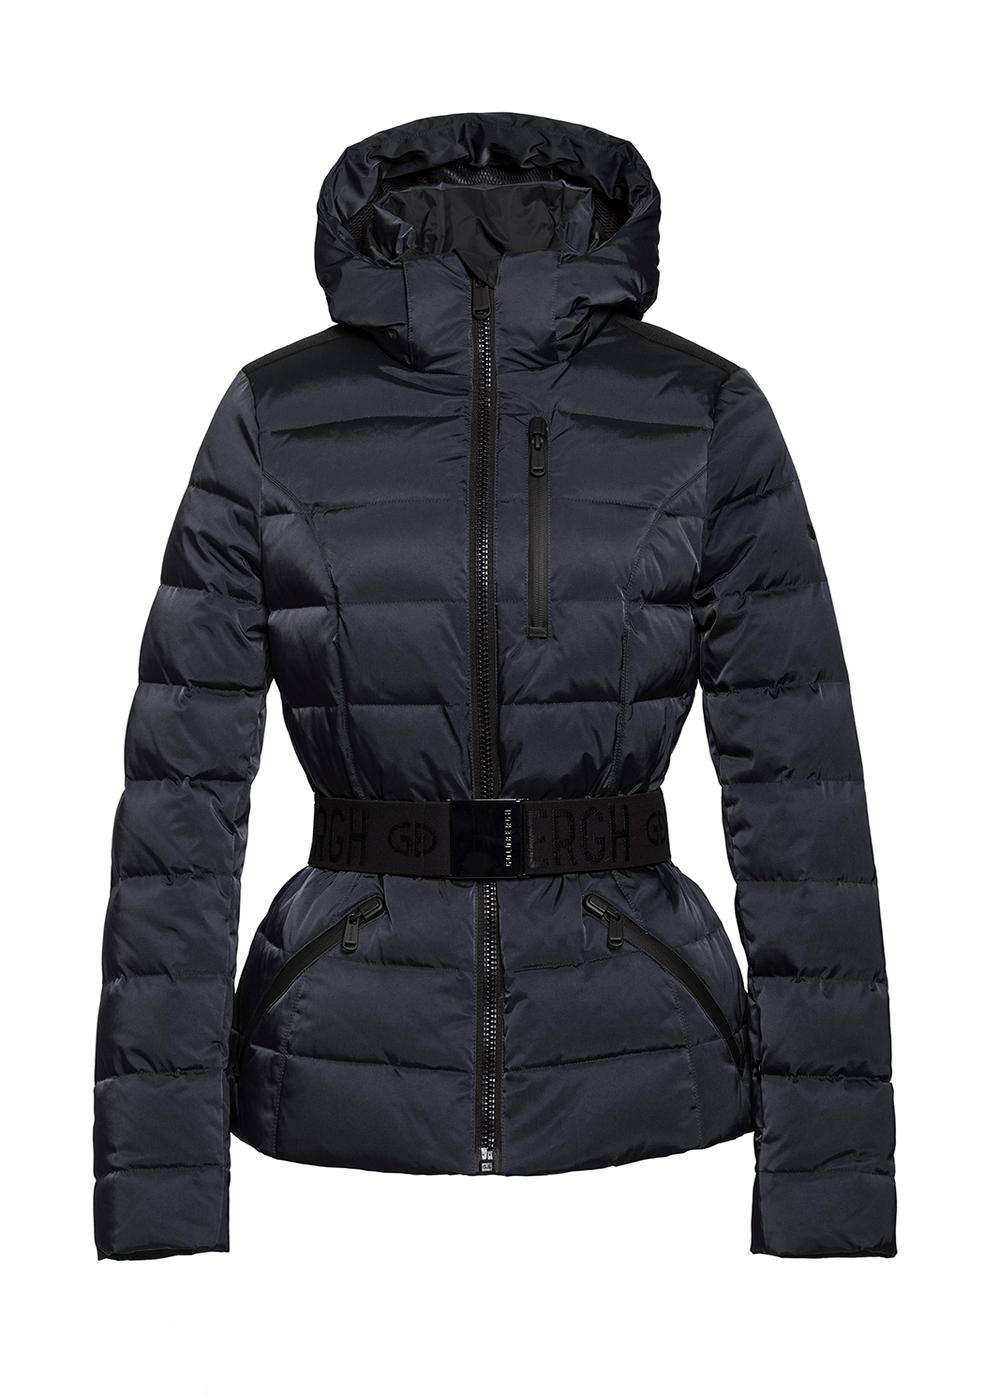 Soldis Downfilled Black Ski Jacket by Goldbergh